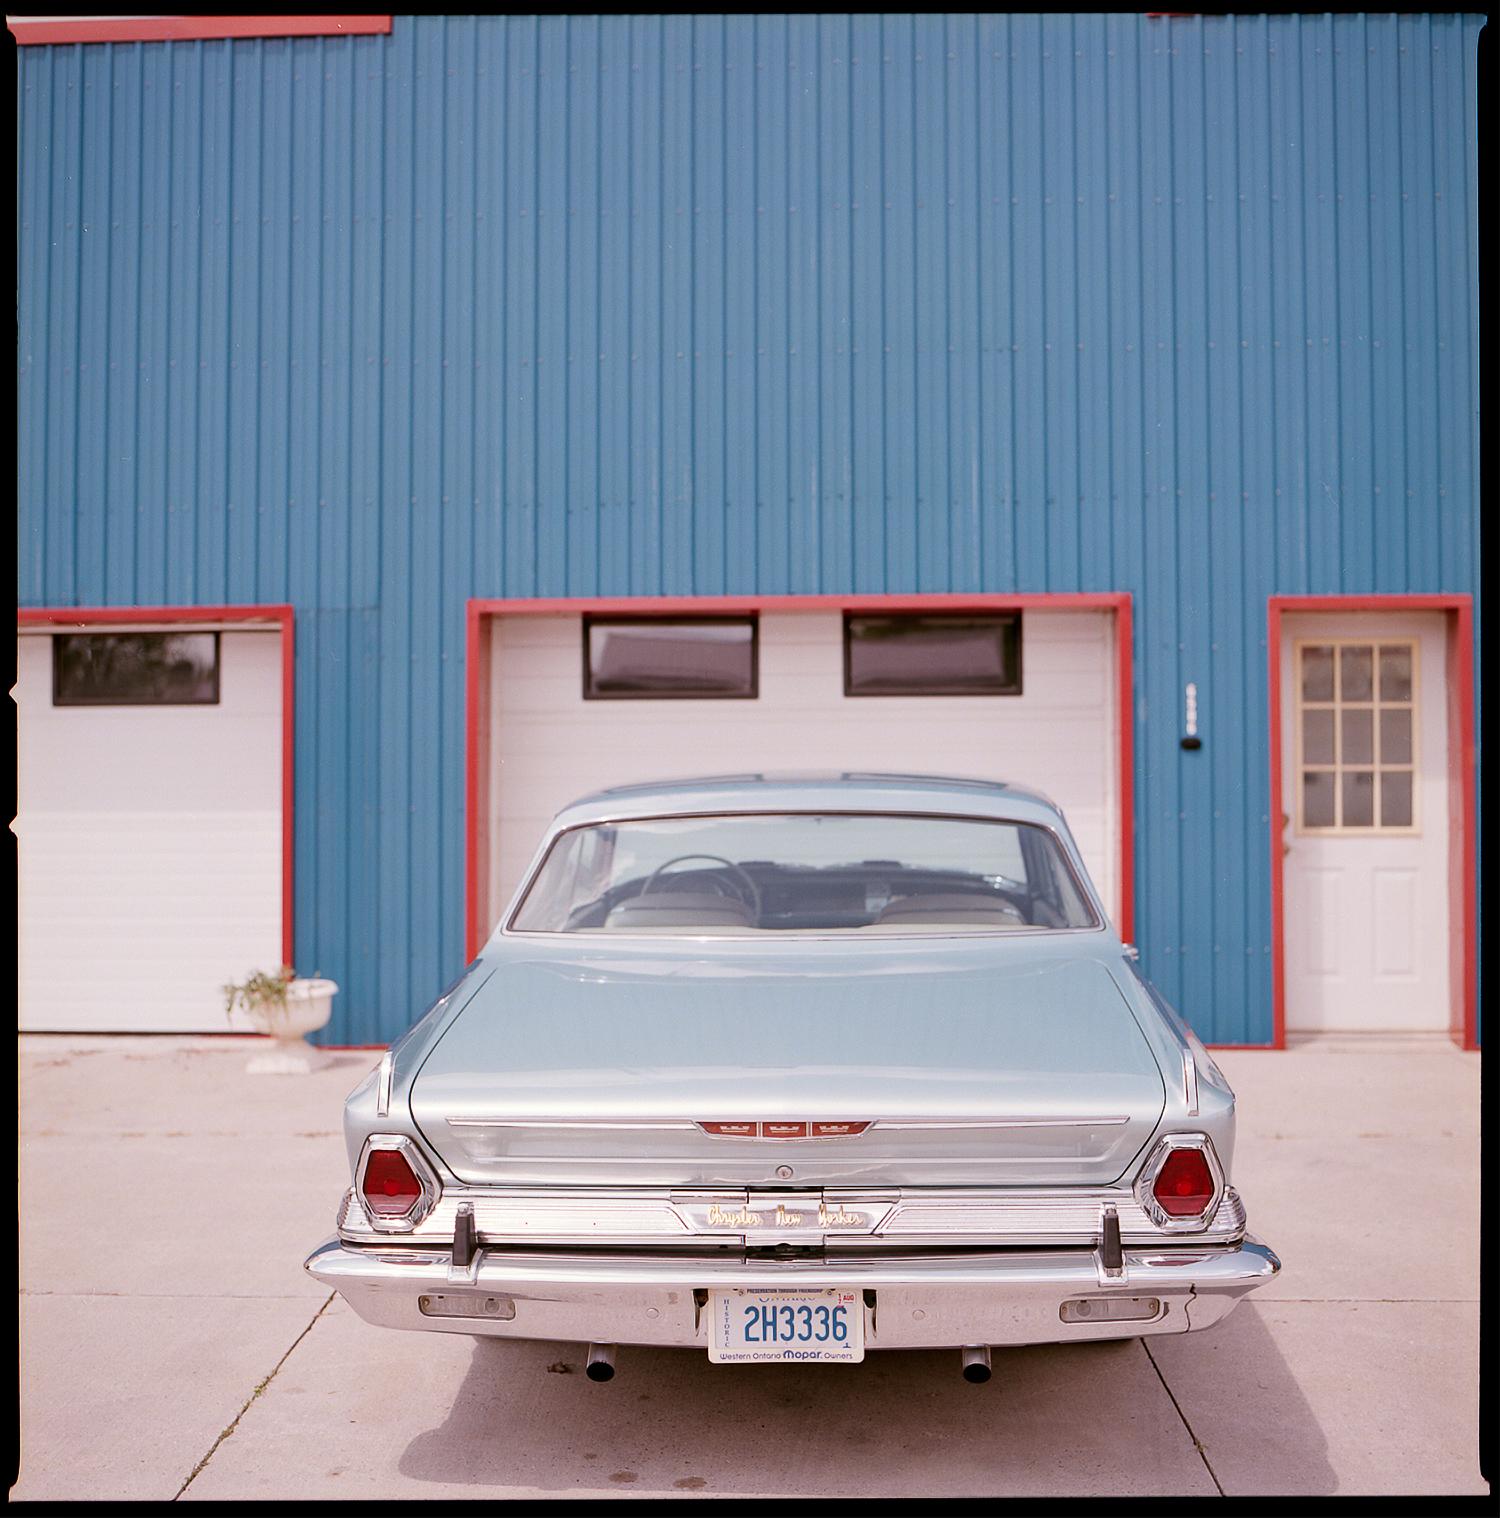 Kodak-Portra-160-Hasselblad-501CM-6x6-Chatam-Ontario-Vintage-Blue-Hues.jpg